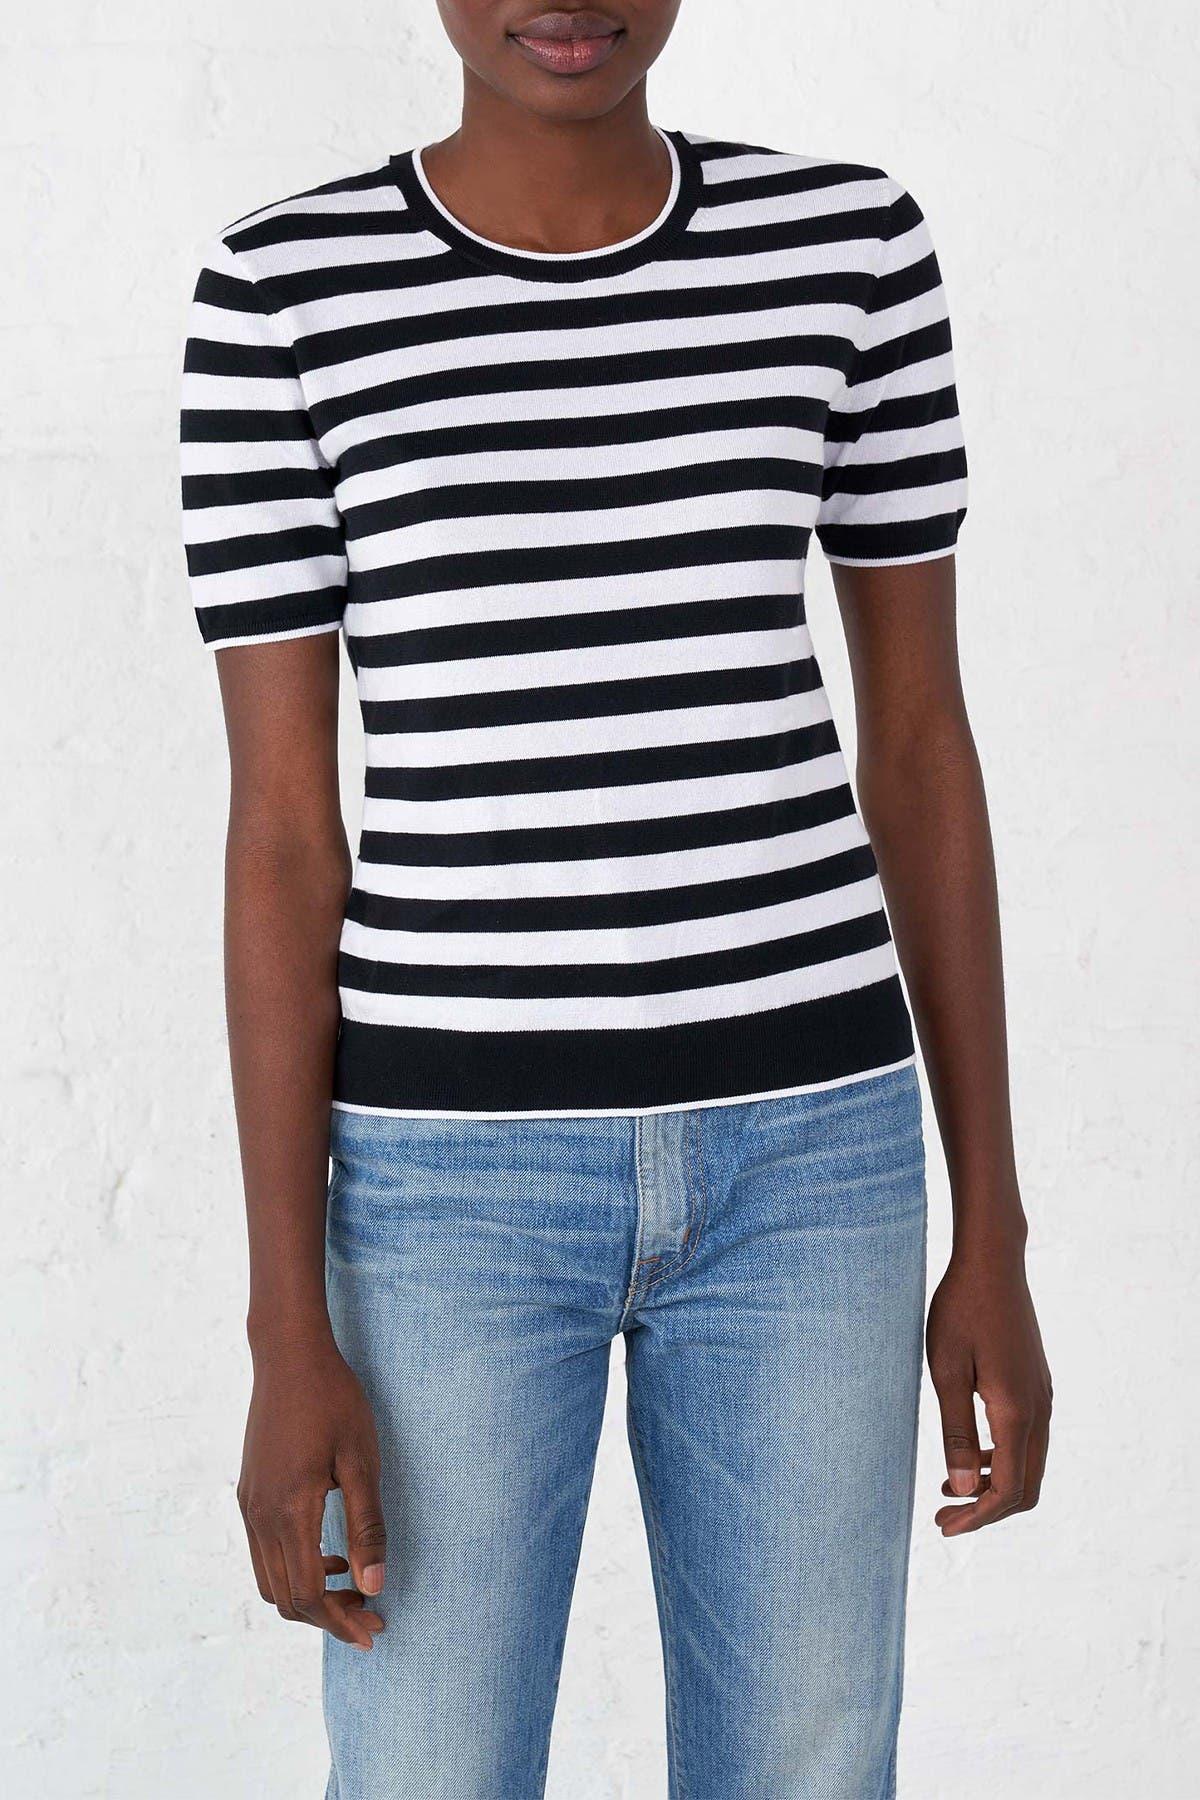 1940s Blouses and Tops LA LIGNE Fitted Stripe Cotton Sweater Tee - Blackwhite at Nordstrom Rack $69.97 AT vintagedancer.com